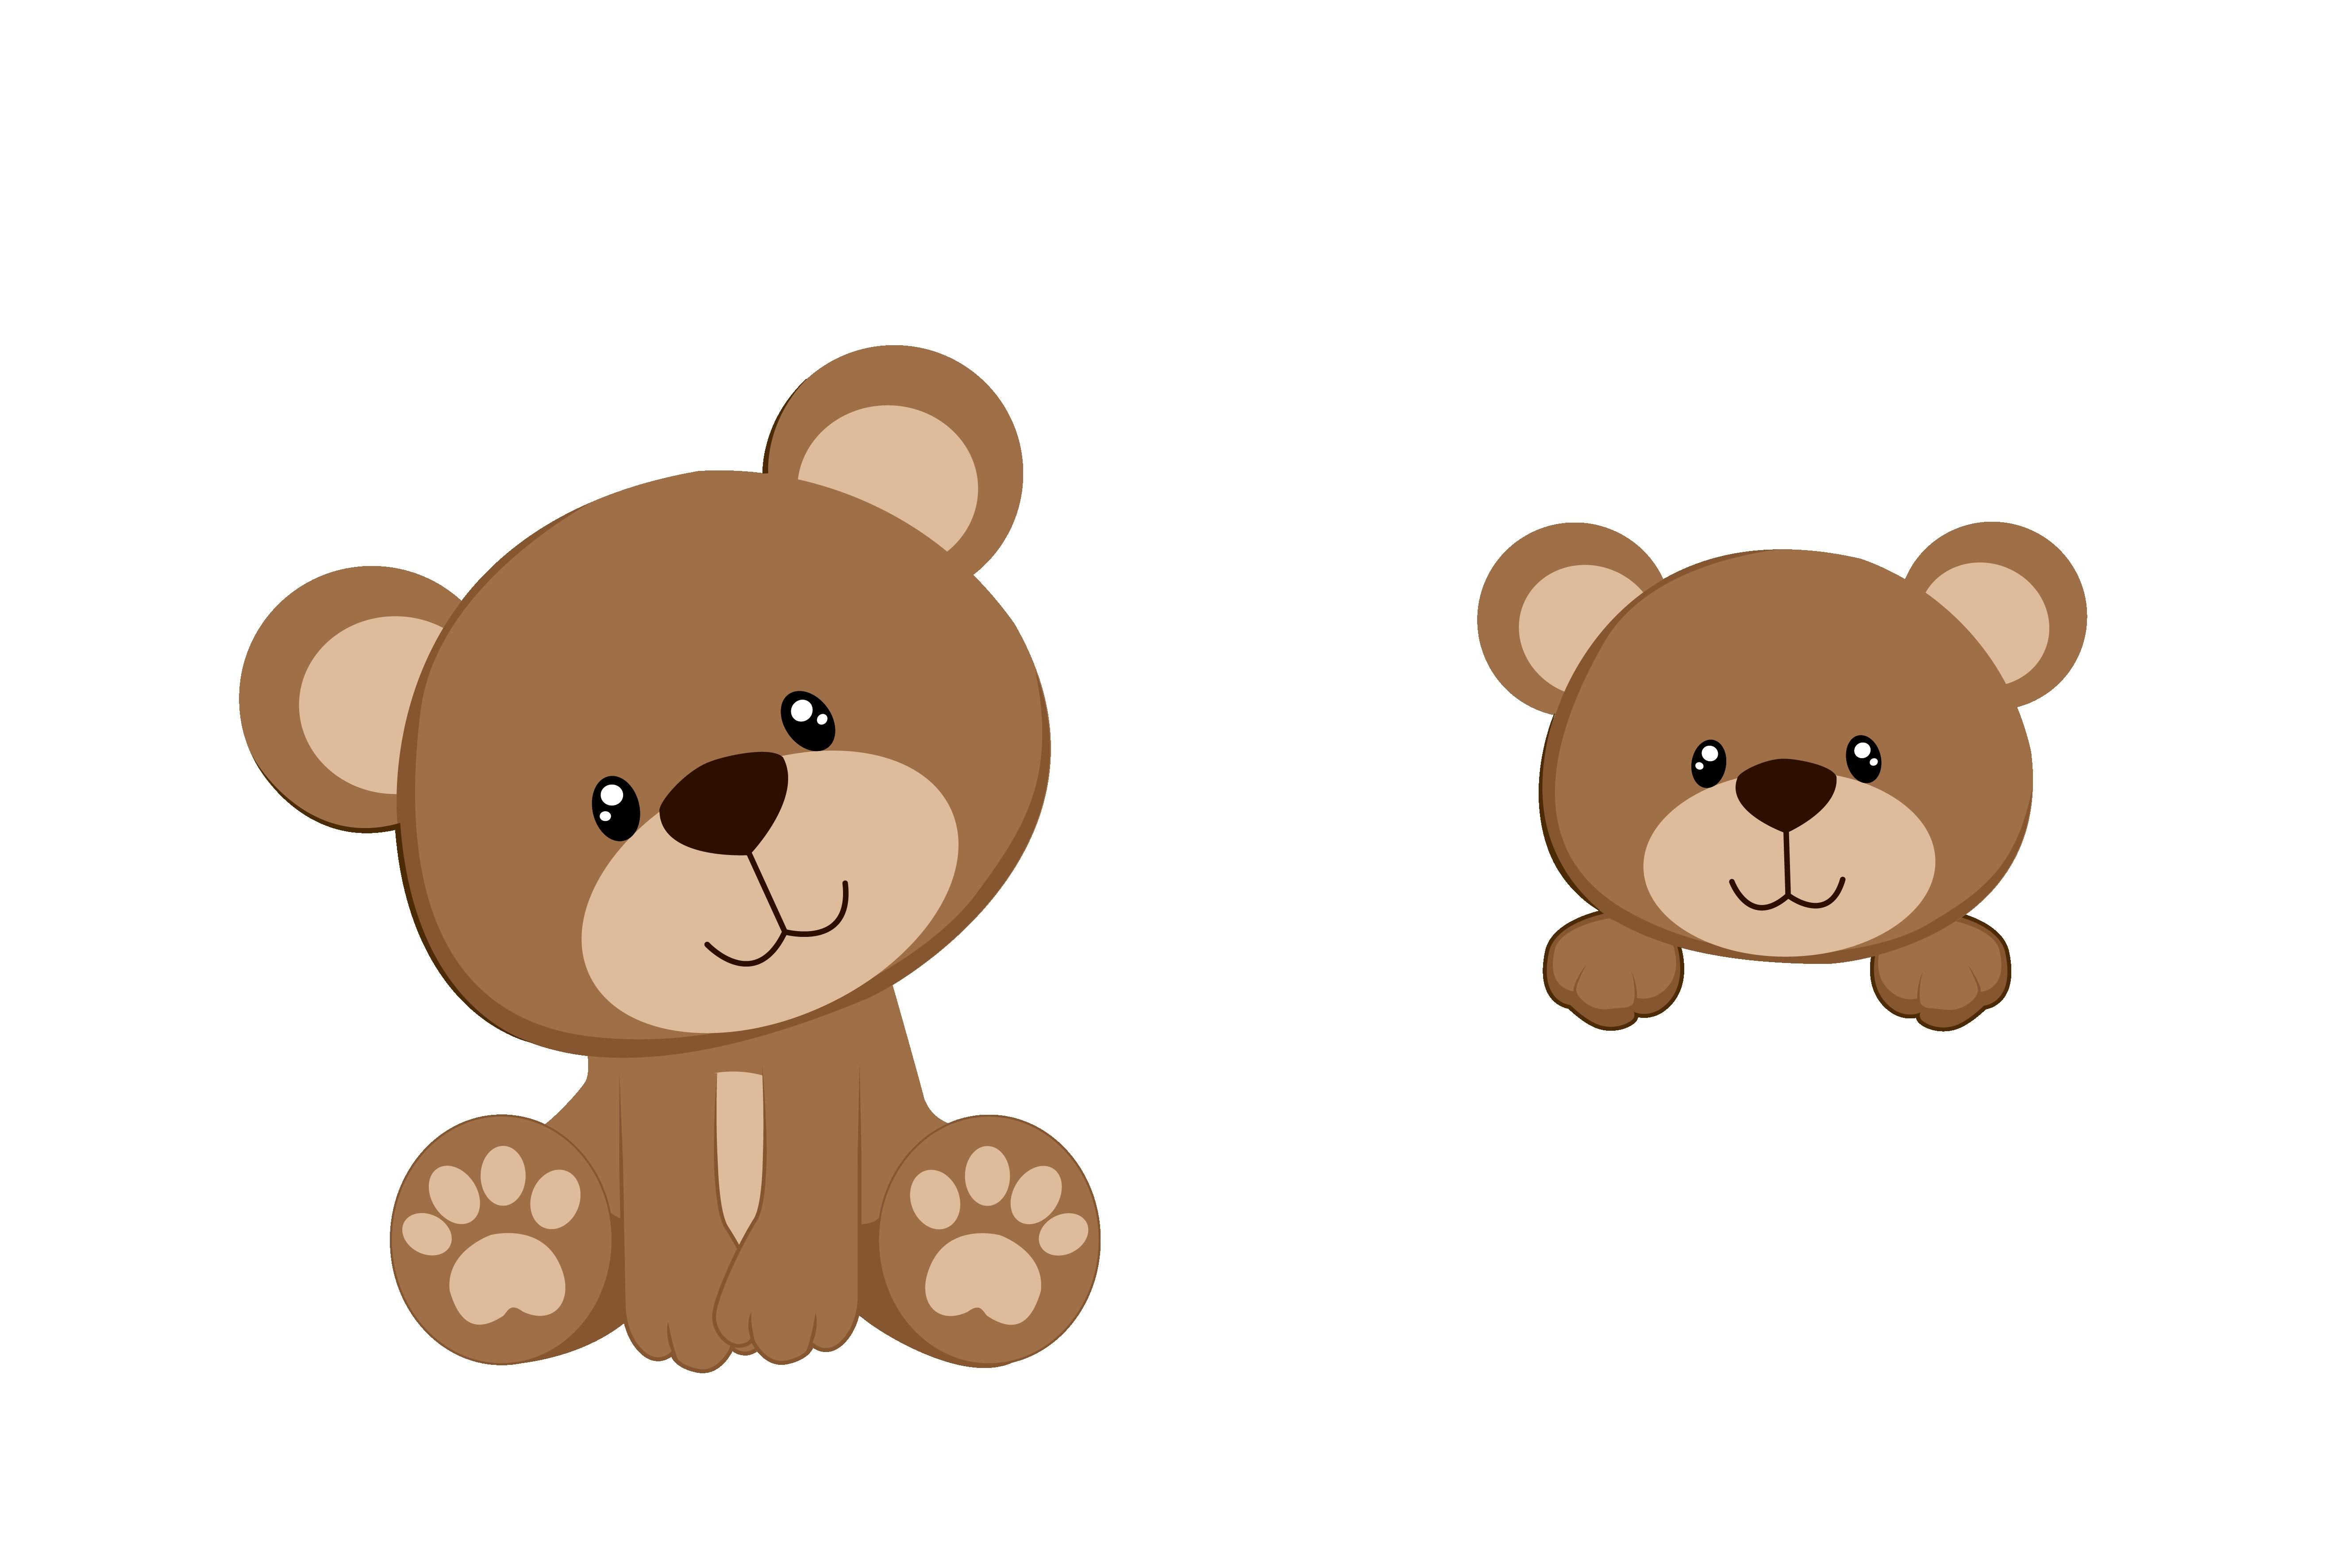 Bear clipart baby shower. Teddy decorations unique